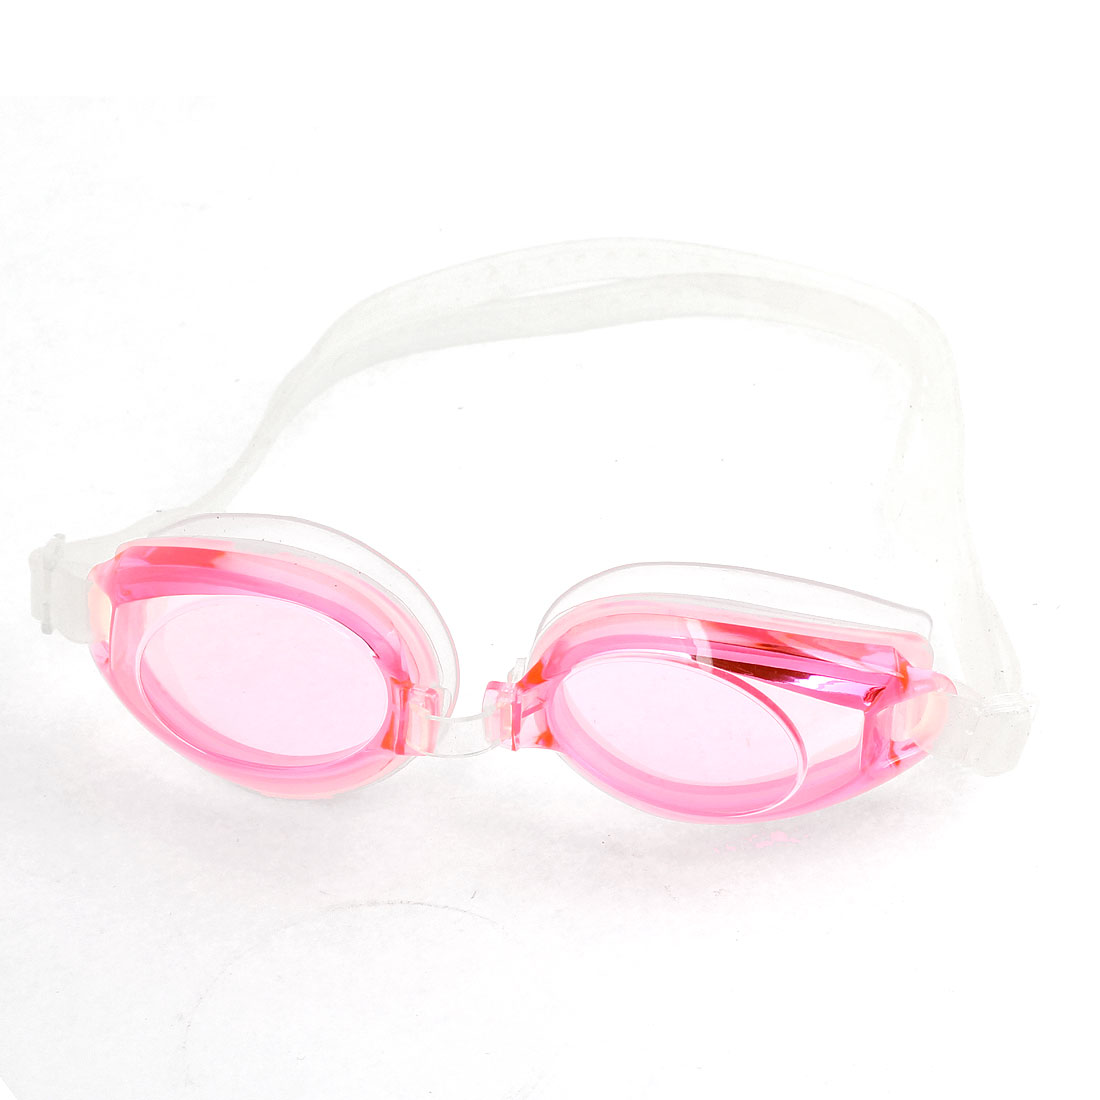 Children Silicone Stretch Strap Swimming Goggles Pink Clear